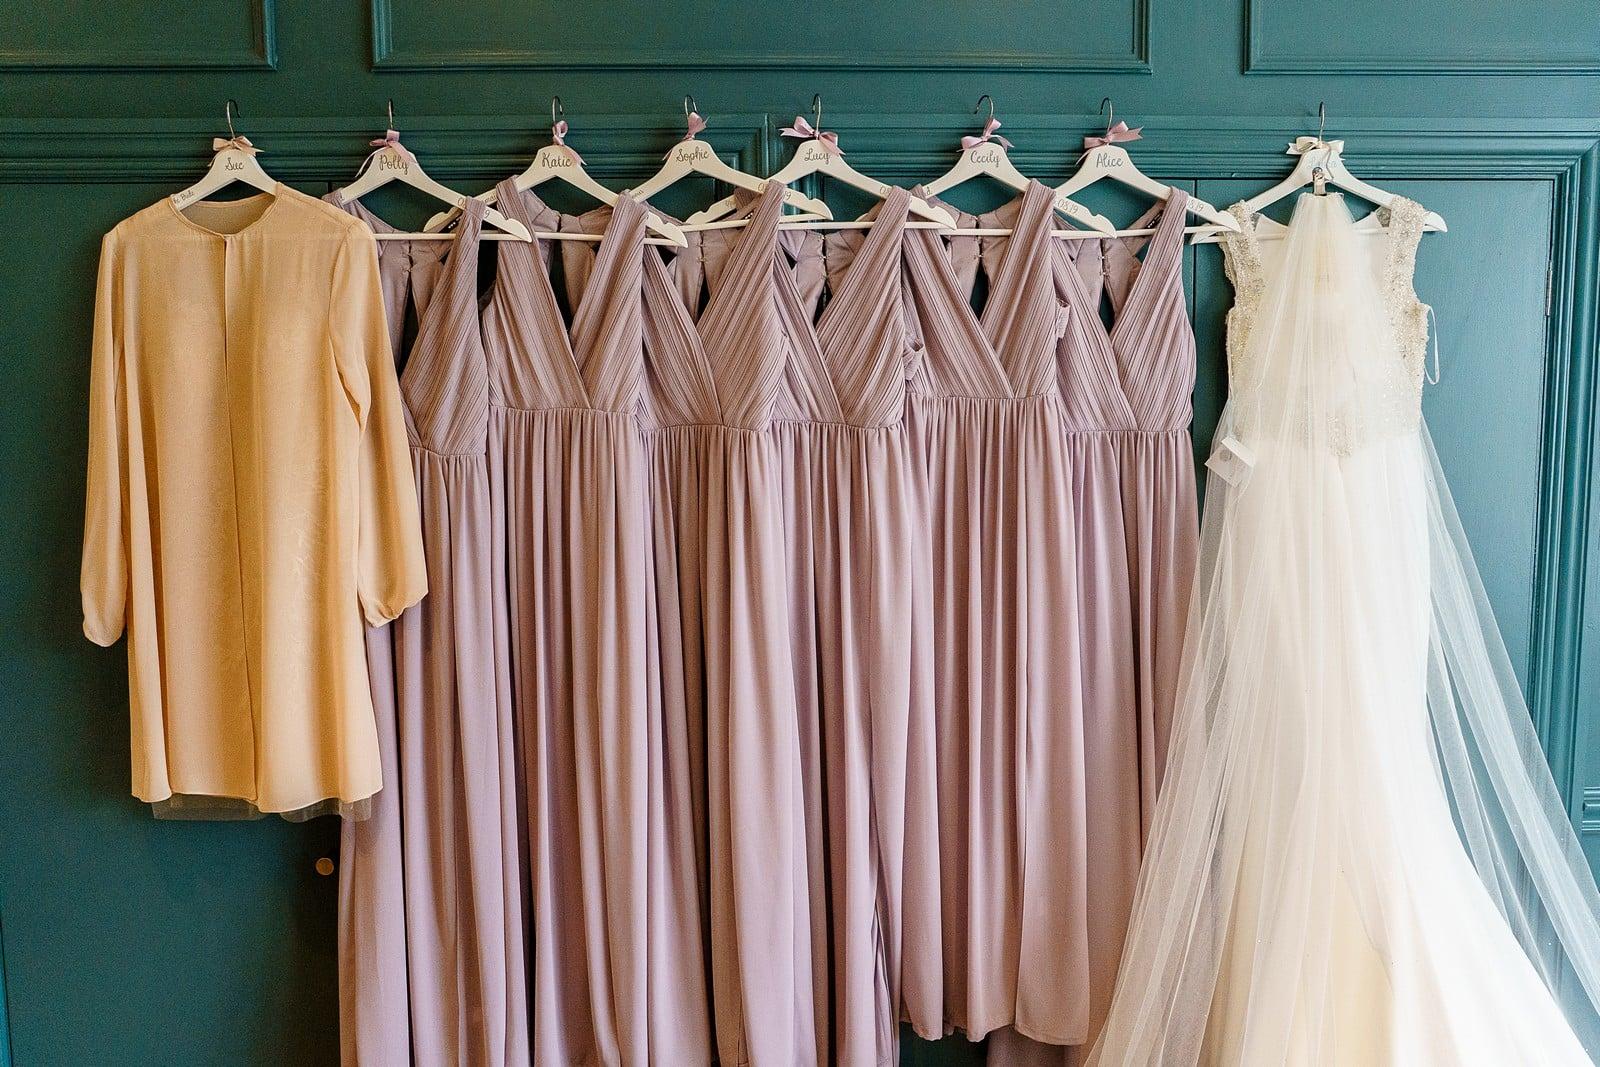 Bridemaids dress's at the greenbank hotel